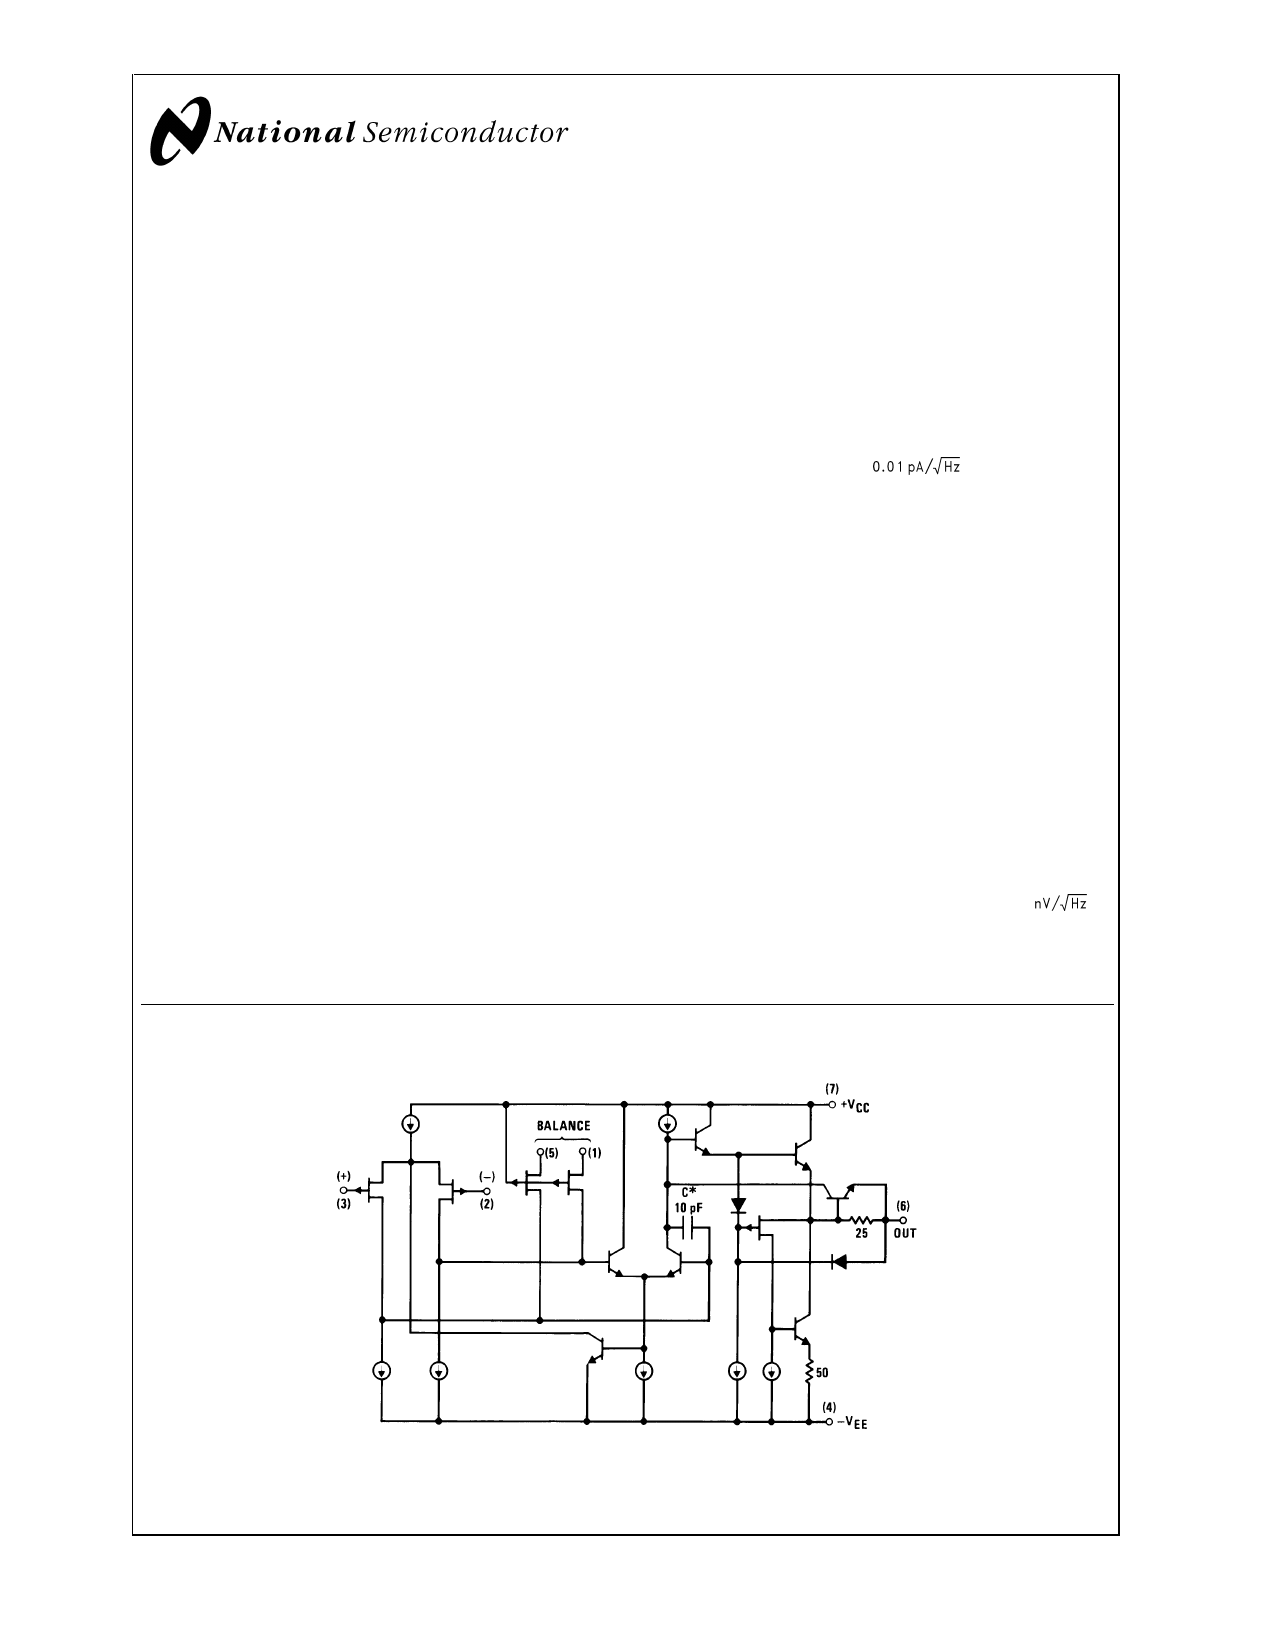 LF355 데이터시트 및 LF355 PDF